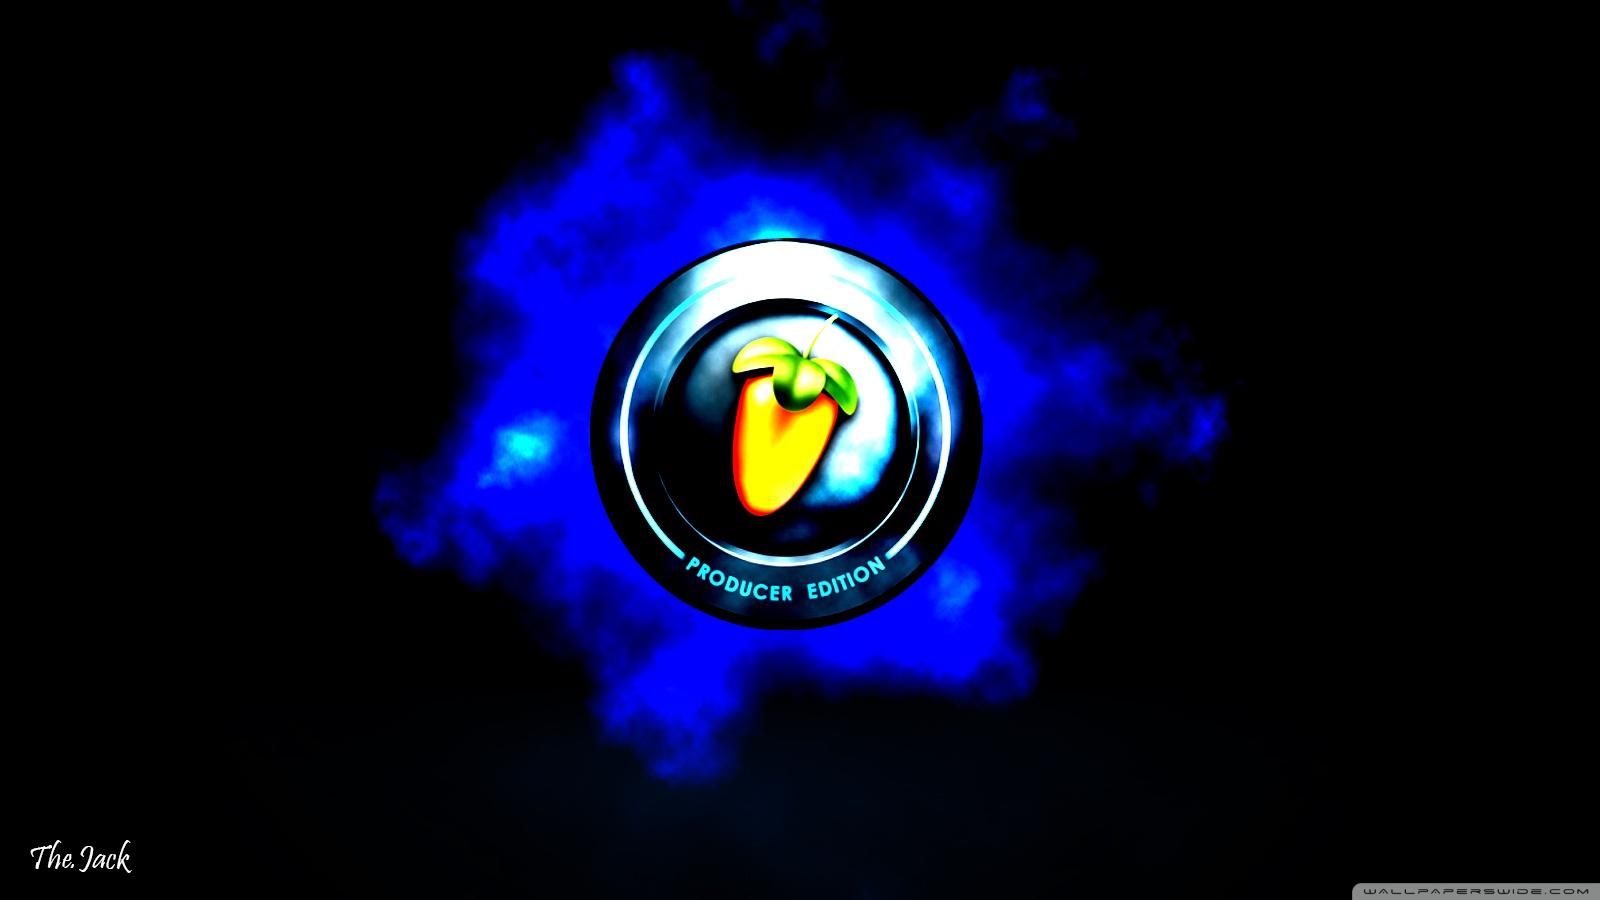 FL Studio Logo BG 4K HD Desktop Wallpaper for 4K Ultra HD TV 1600x900